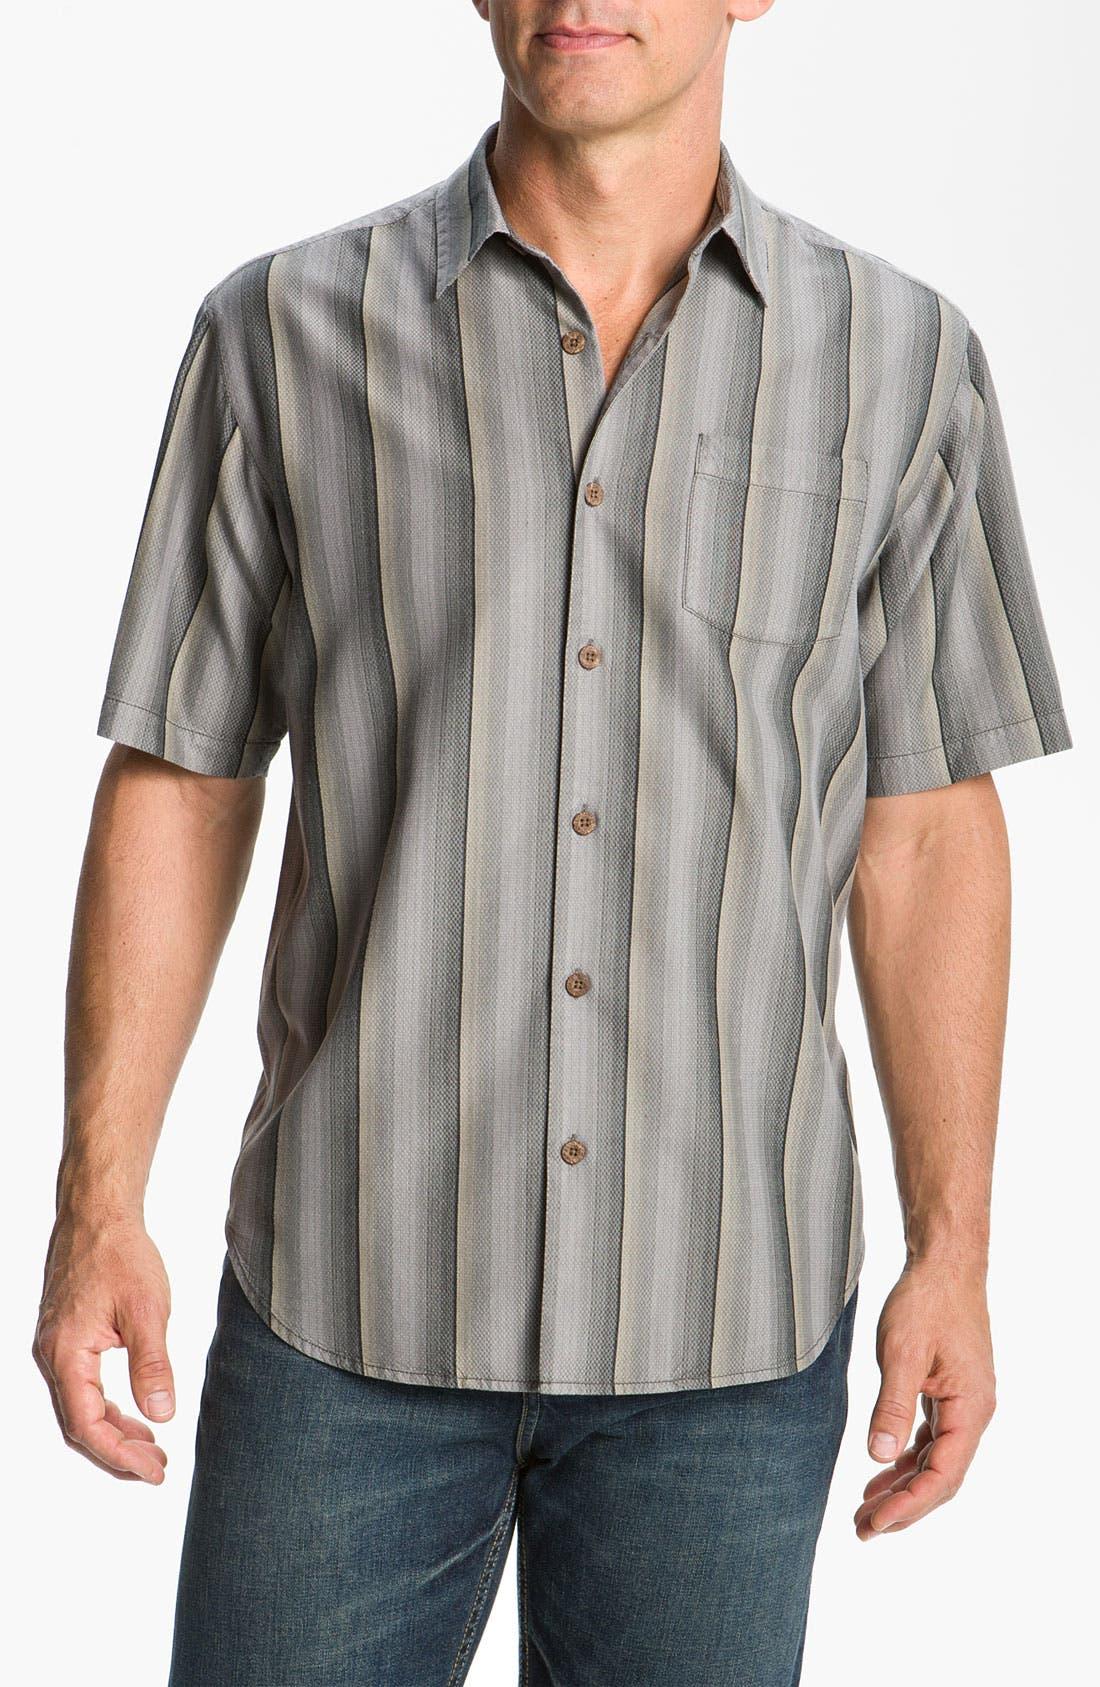 Alternate Image 1 Selected - Tommy Bahama 'Sampan Stripe' Silk Sport Shirt